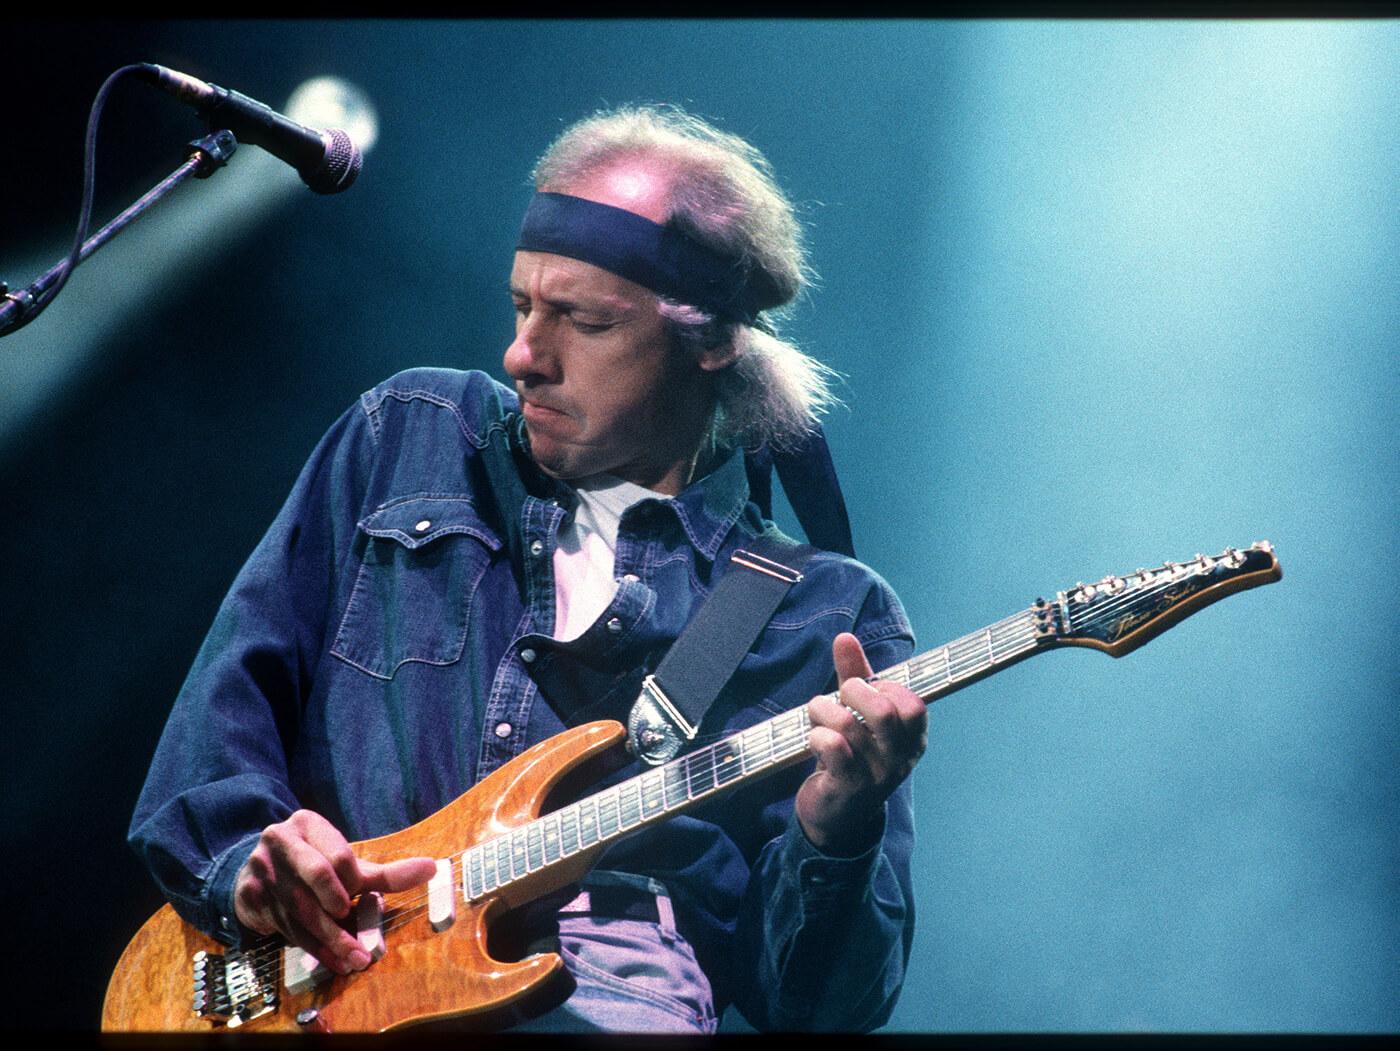 Older Mark Knopfler playing orange guitar